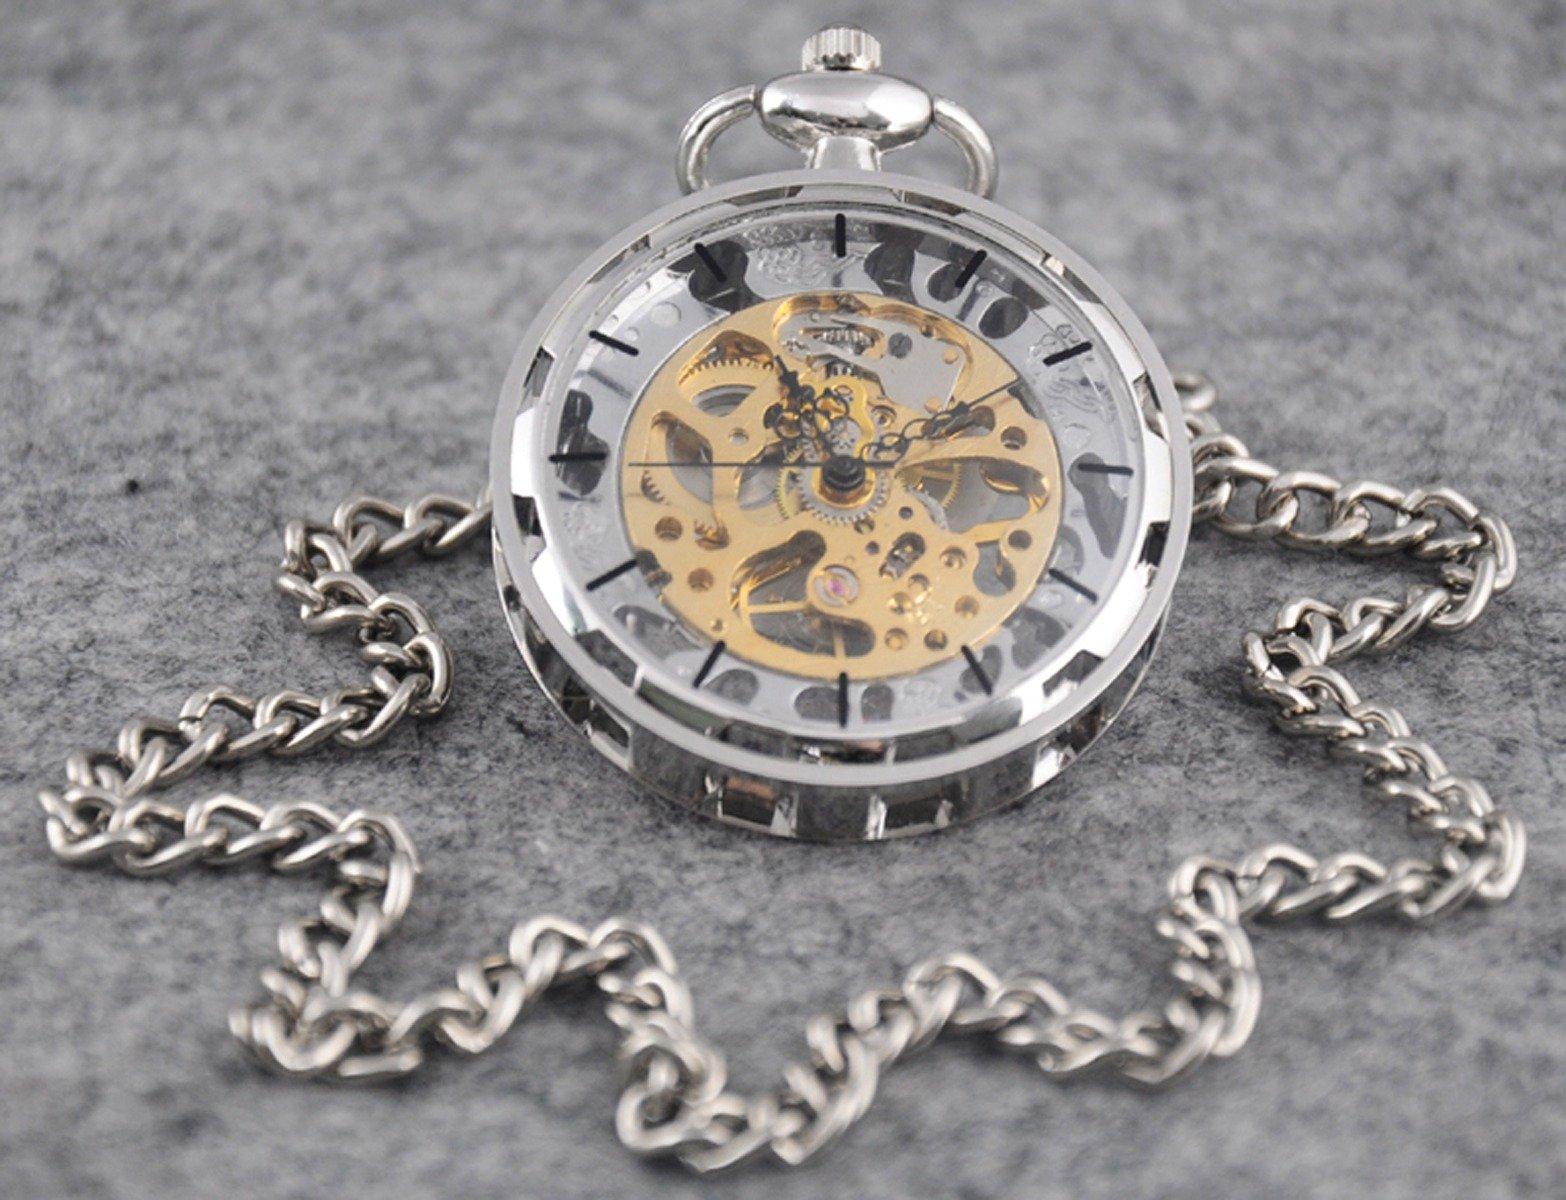 VIGOROSO Mens Classic Steampunk Gold Skeleton Hand Wind Mechanical Pocket Watch by VIGOROSO (Image #3)